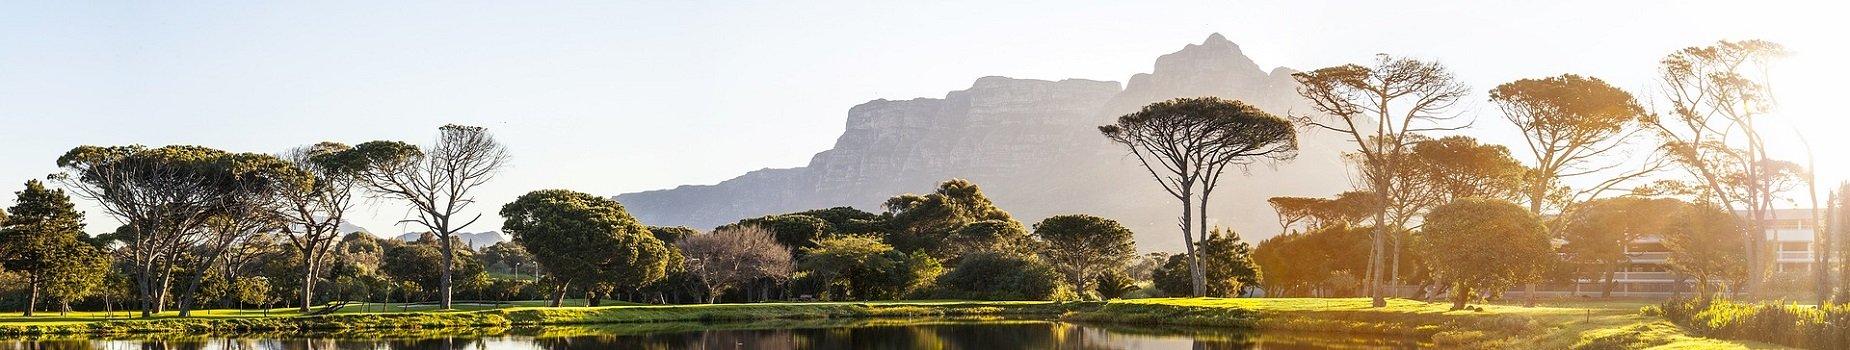 Vliegvelden Zuid-Afrika